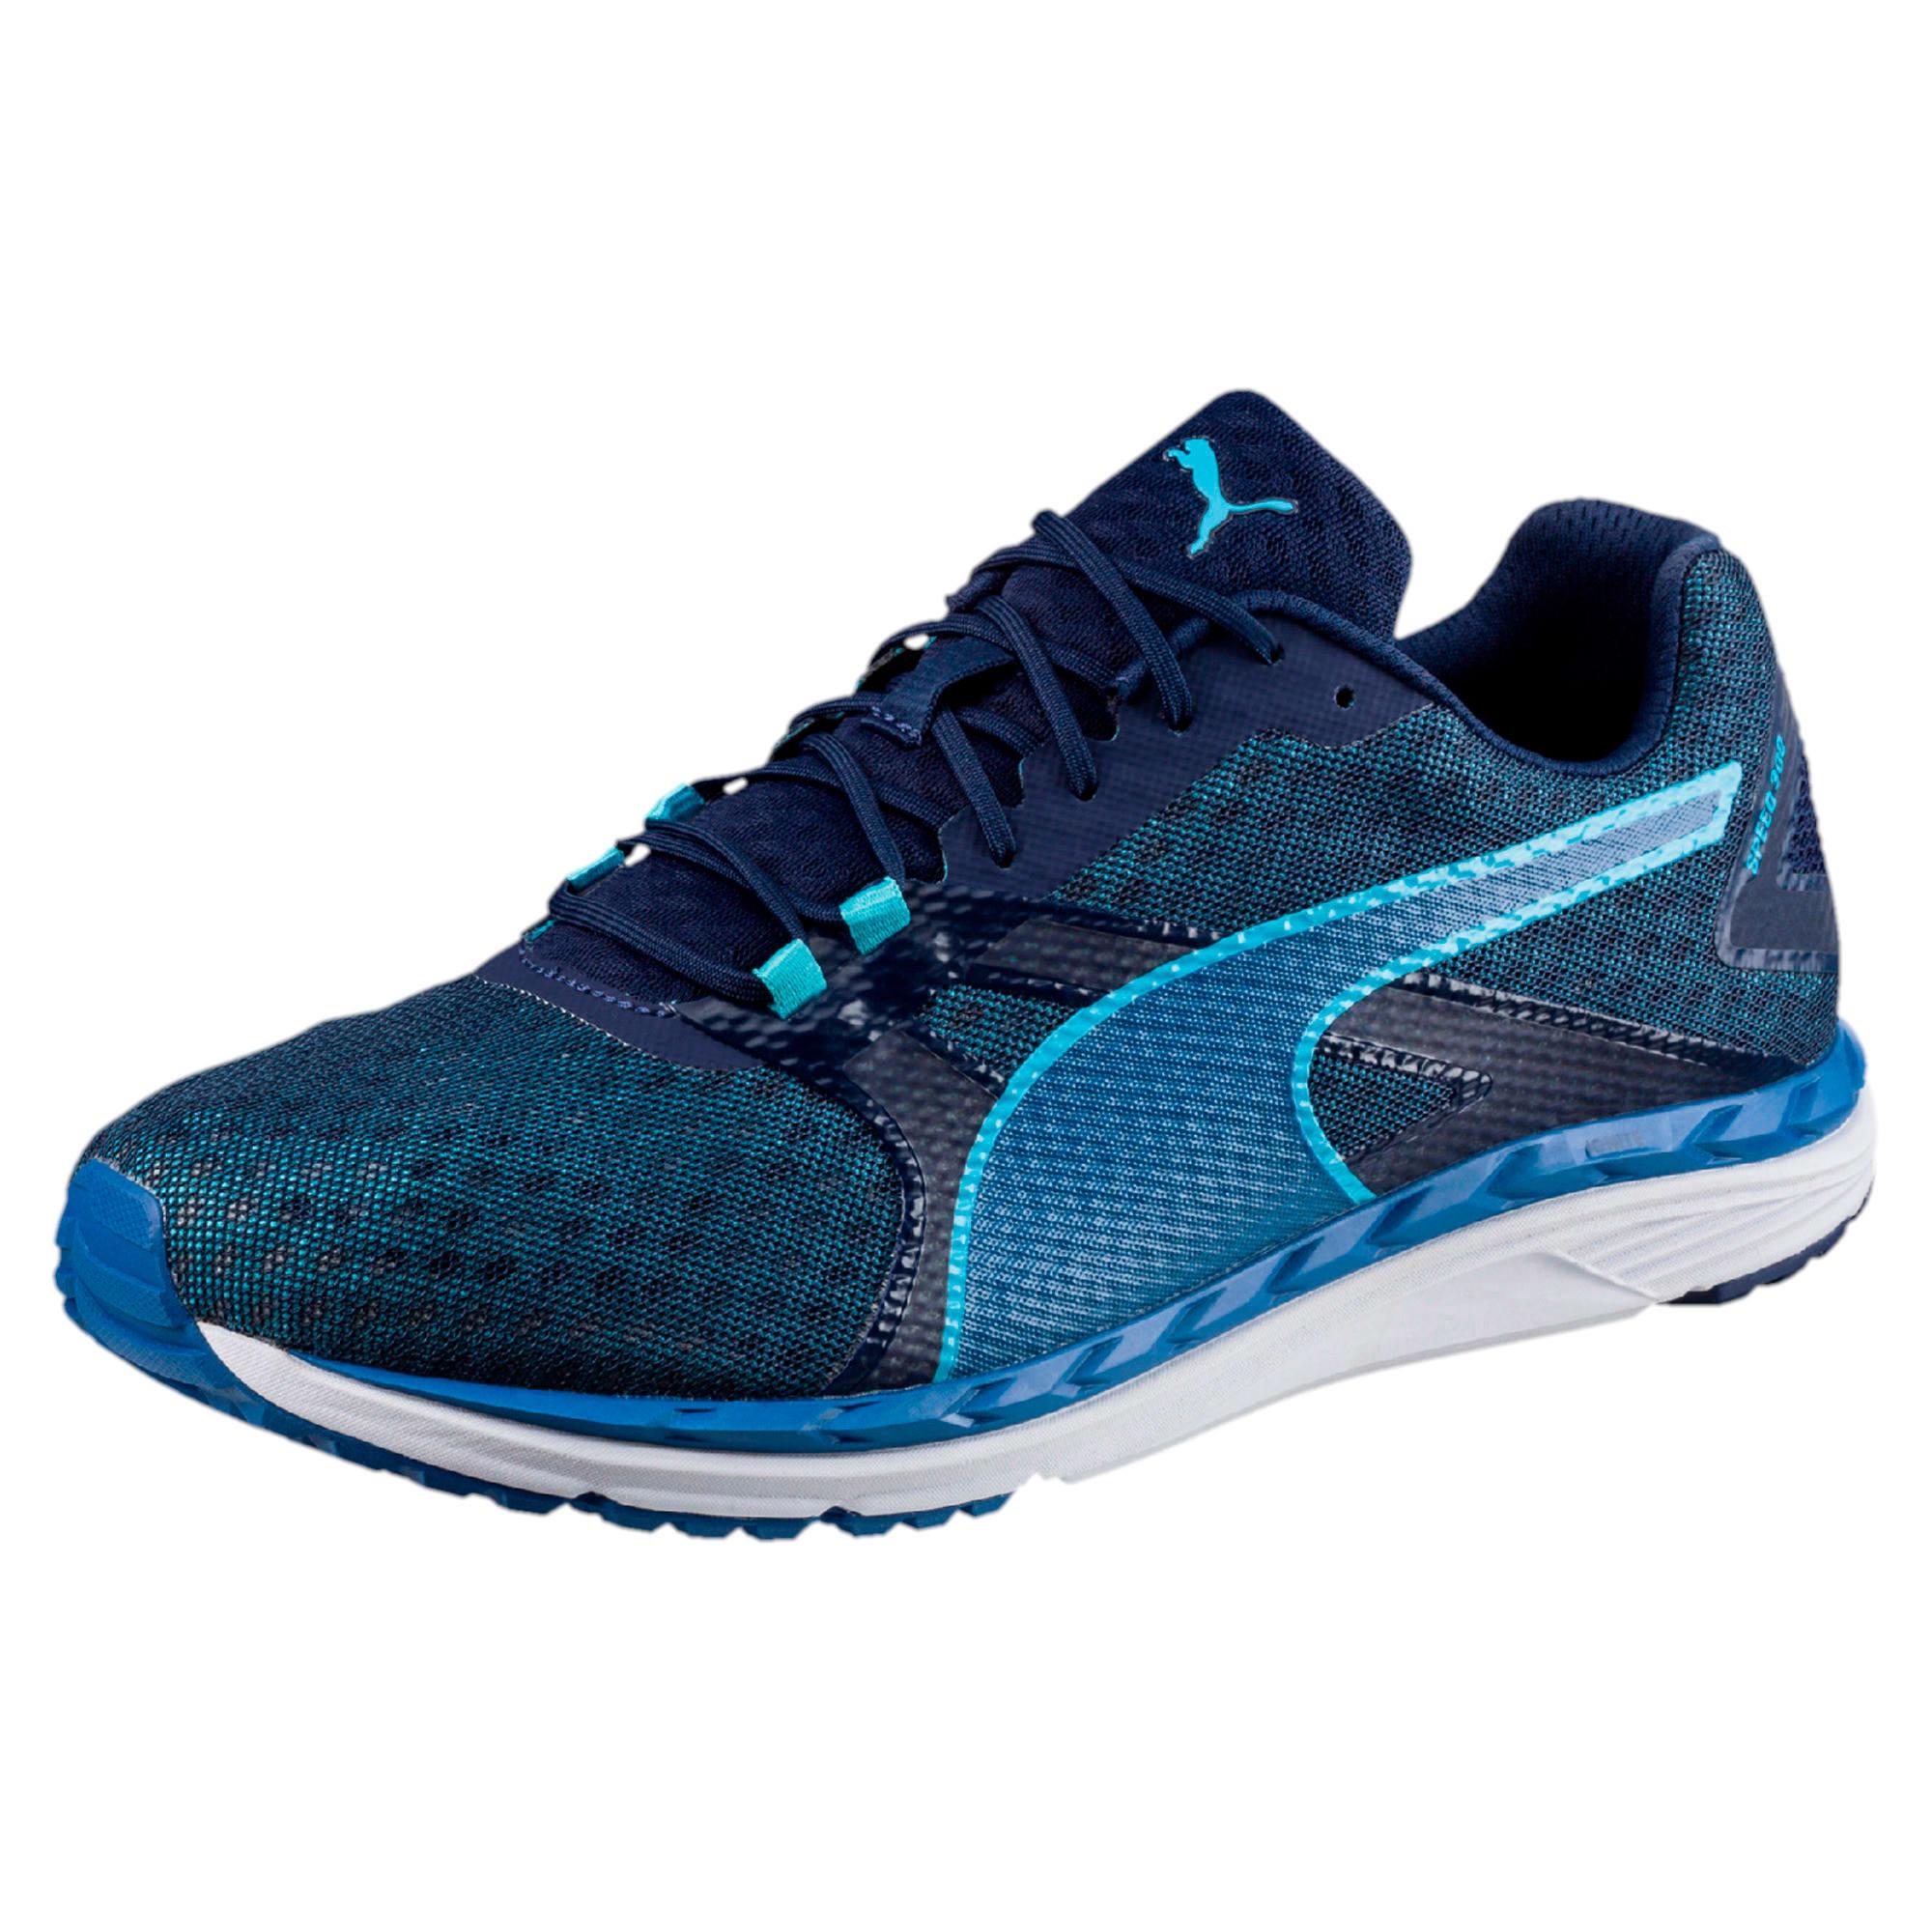 Thumbnail 1 of Speed 300 IGNITE 2 Men's Running Shoes, LapisBlue-BlueDepths-Turq, medium-IND